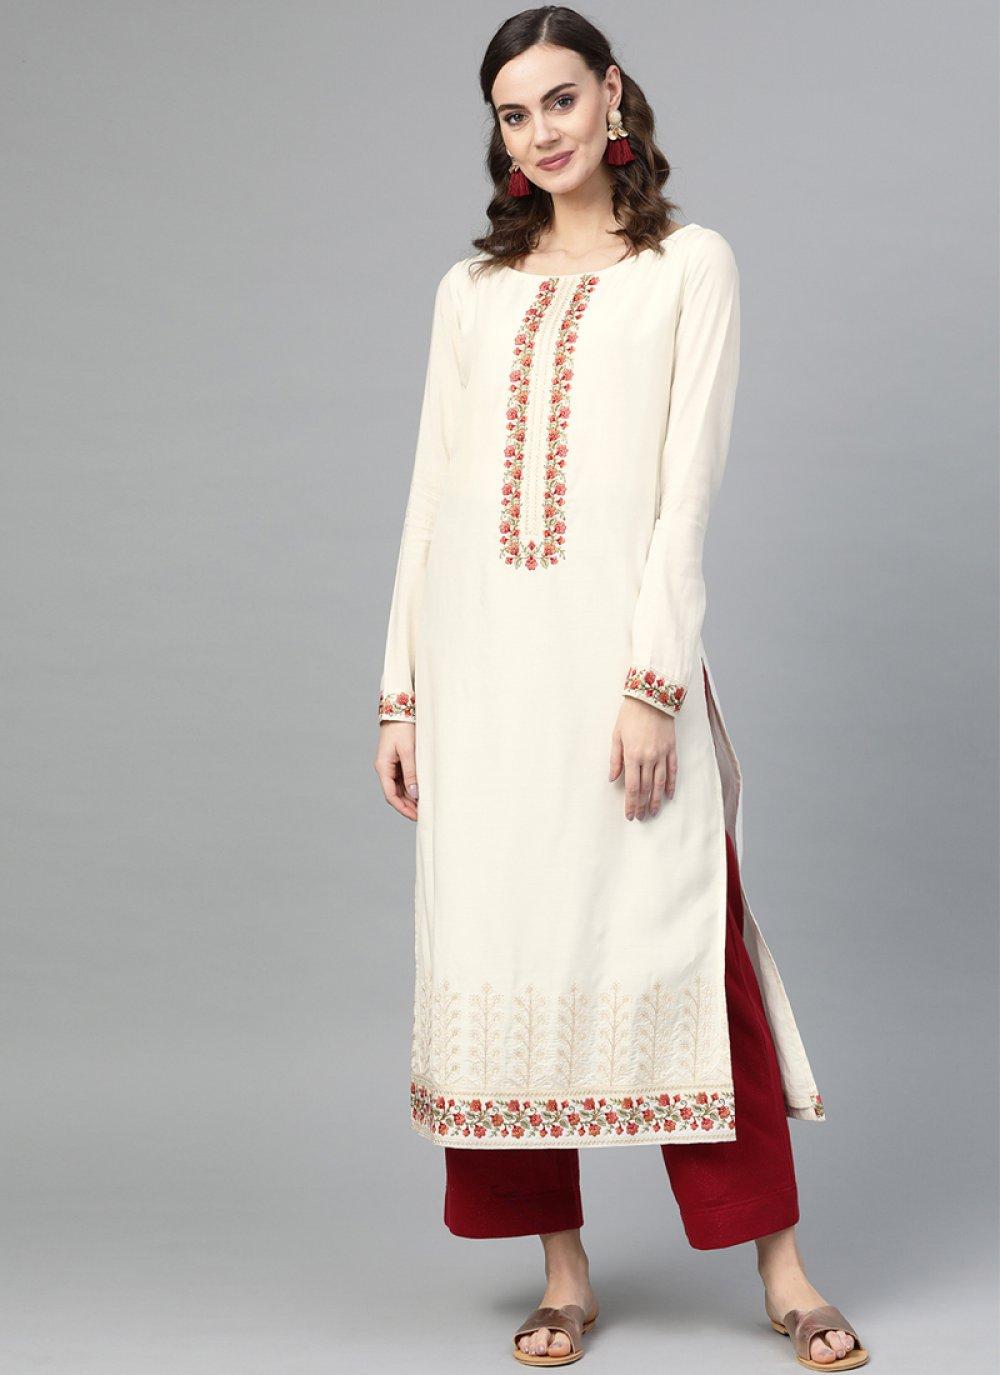 Embroidered Muslin Cream Palazzo Salwar Suit